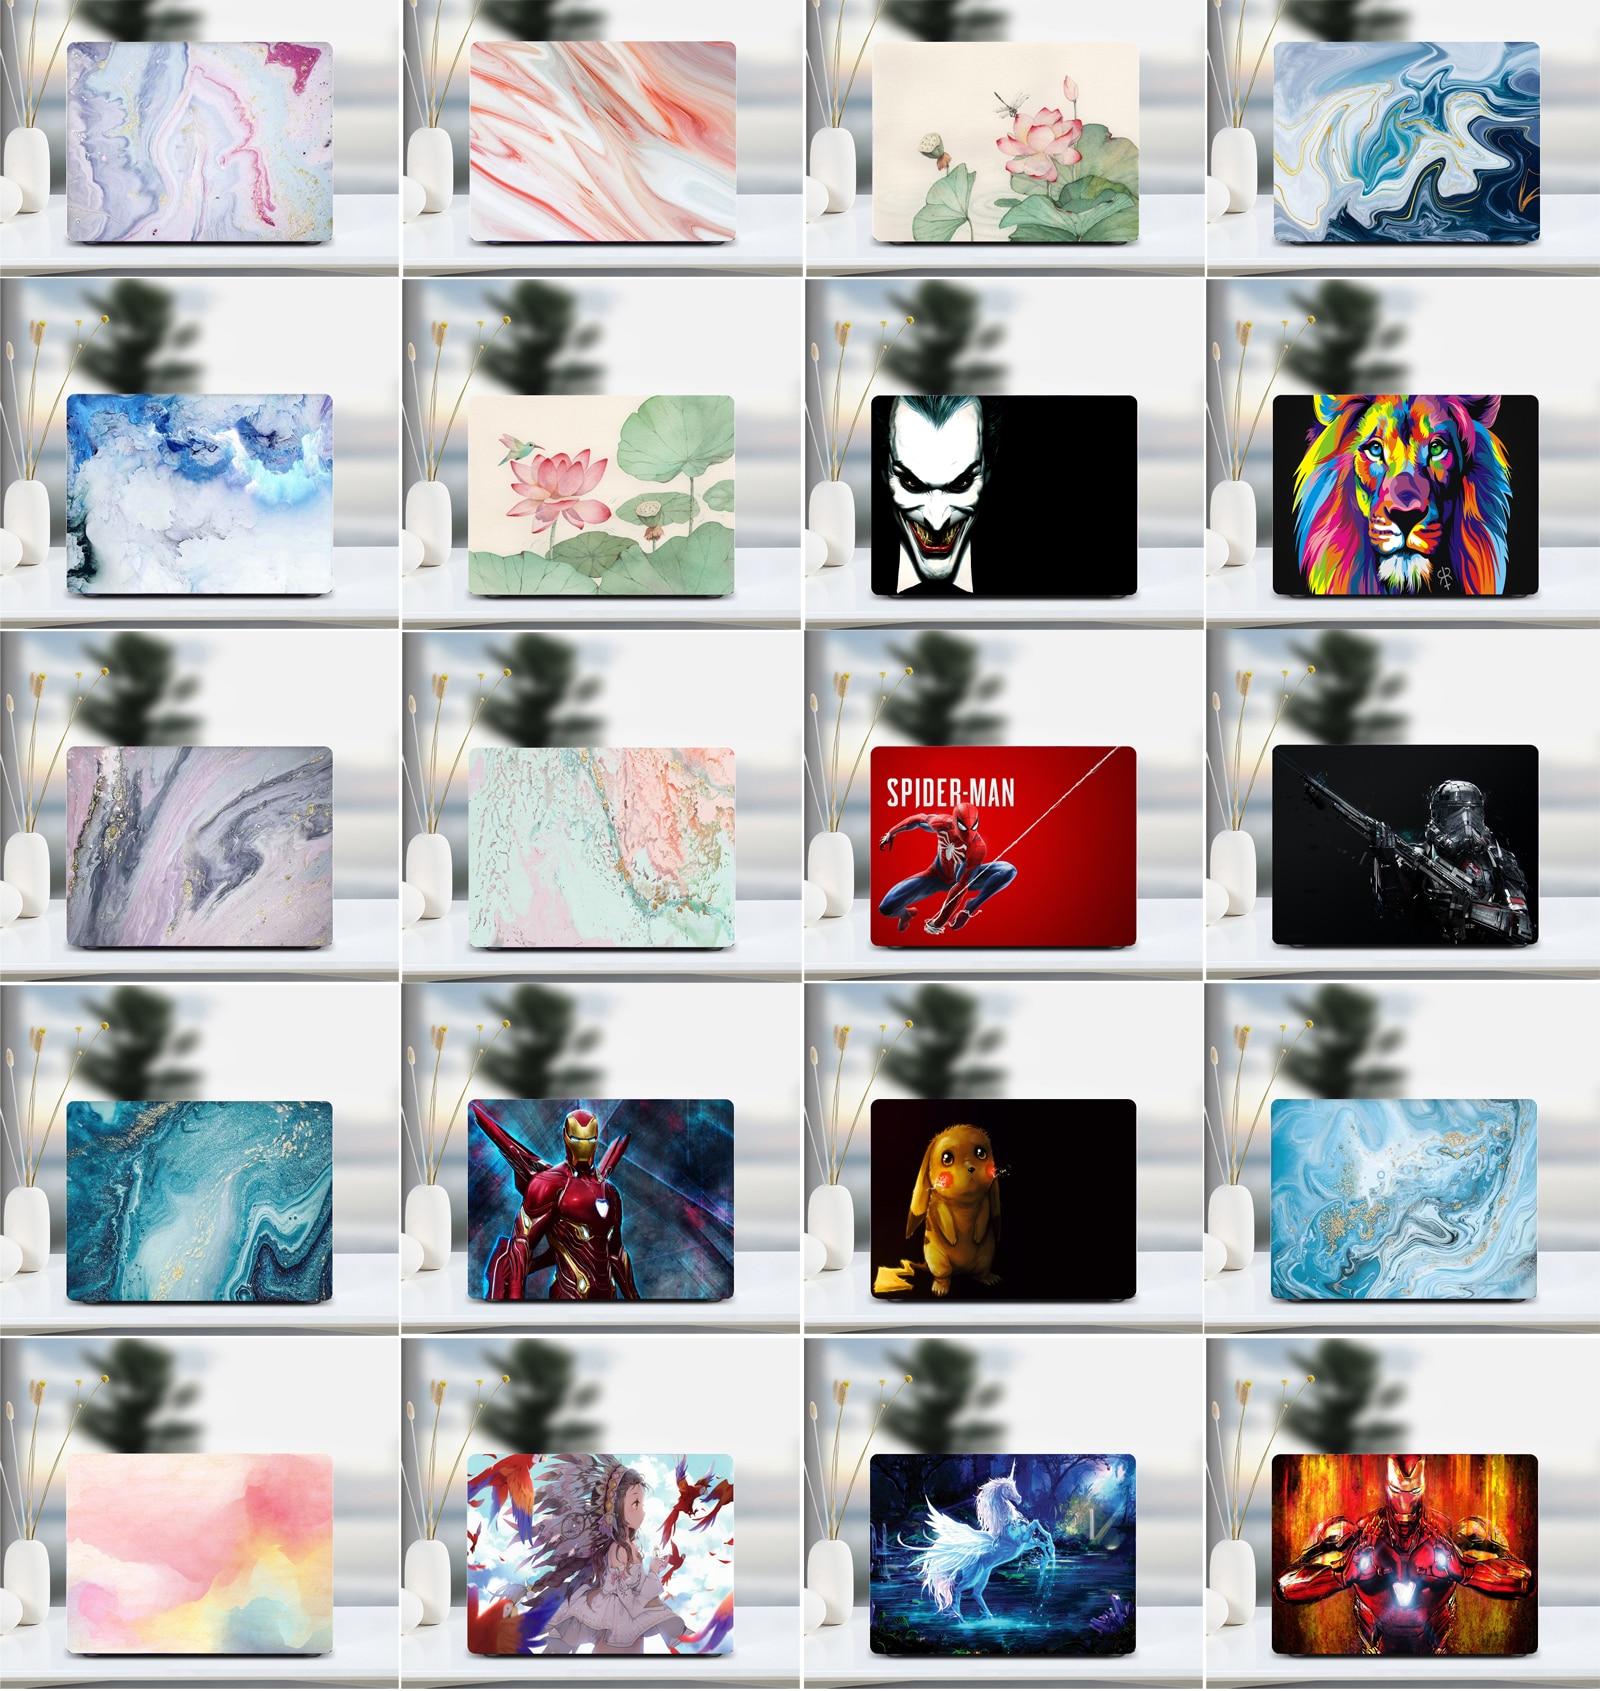 غلاف صلب لجهاز Huawei Matebook ، 13.9 بوصة ، Honor Magicbook ، D14 ، D15 ، 13 ، 14 X Pro